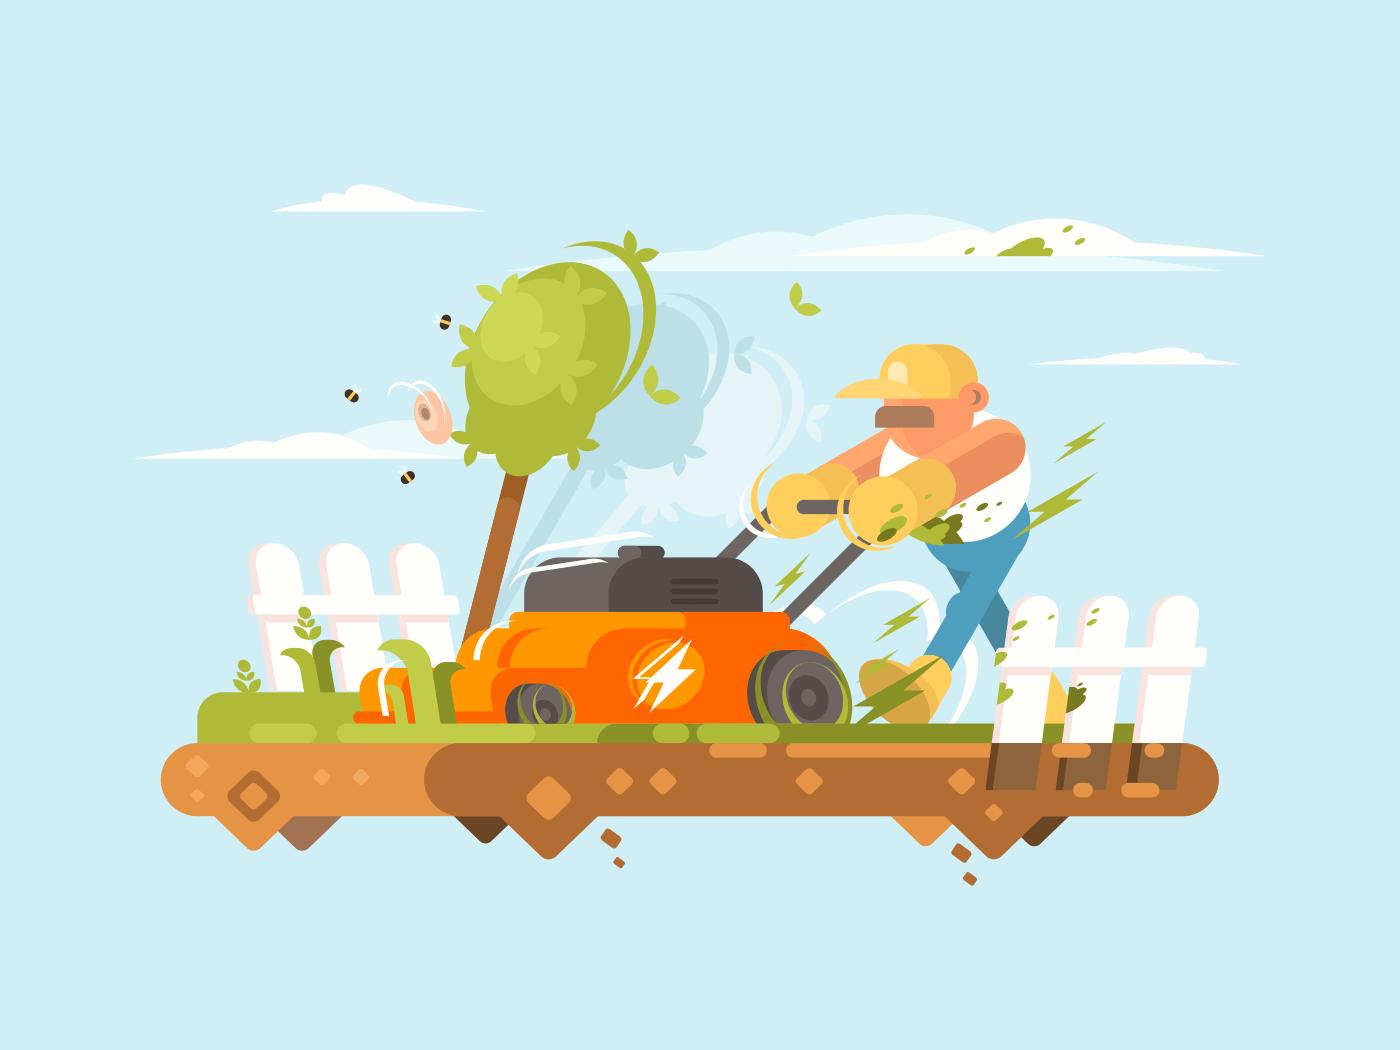 Man mowing grass illustration